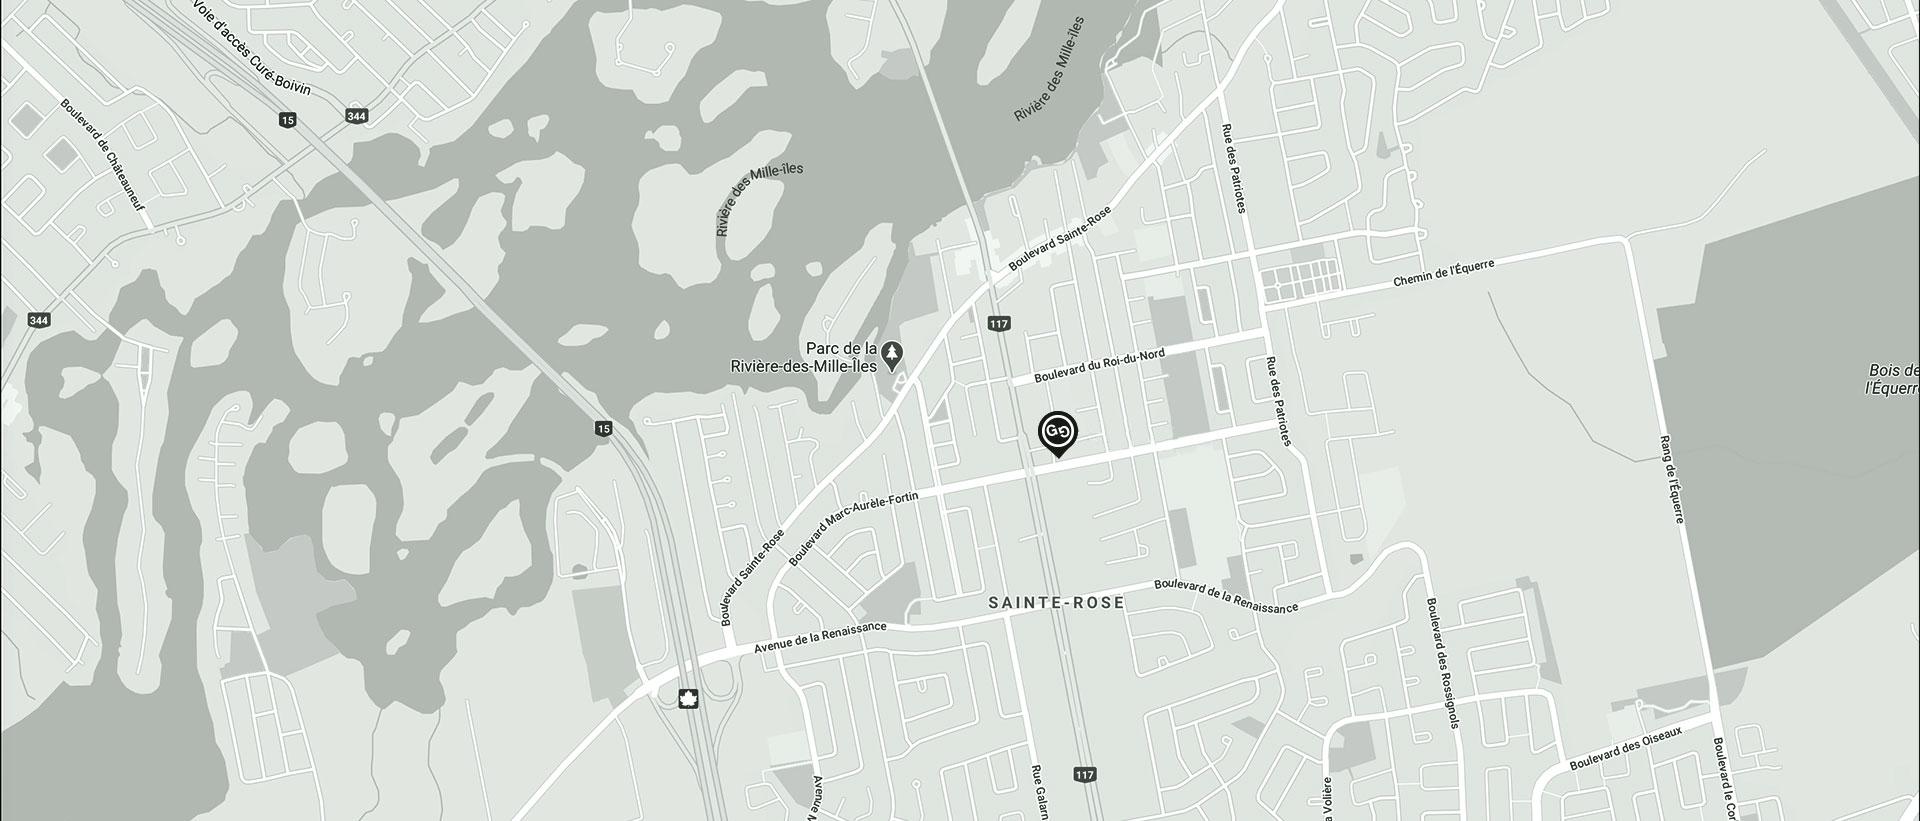 GGEY_BG-1920width_2020-map